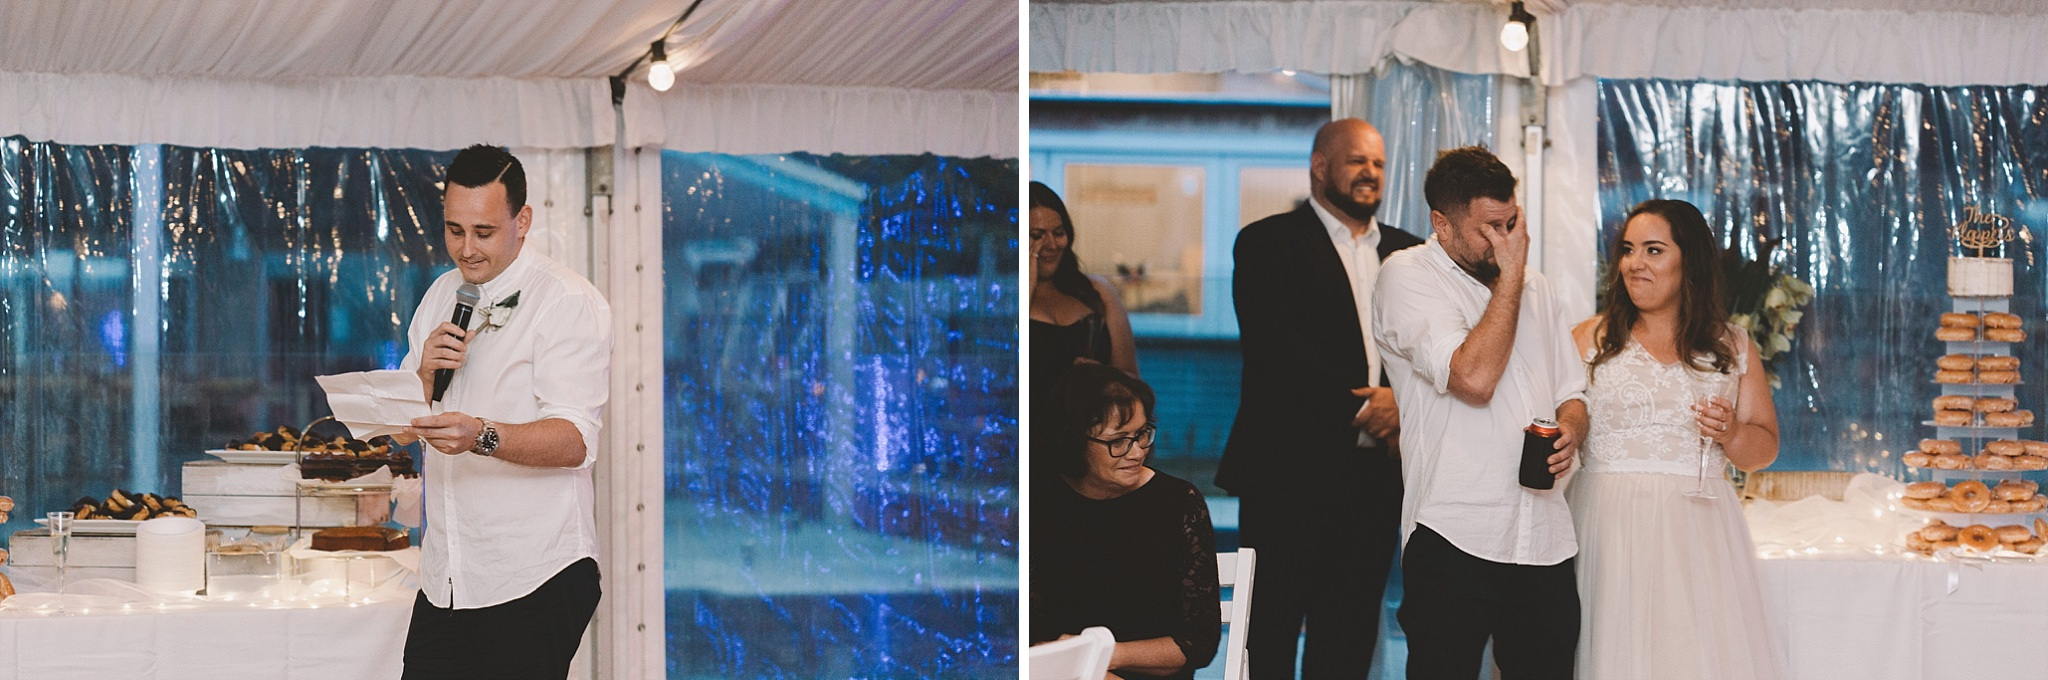 Mornington Peninsula Wedding Photographer 150.JPG